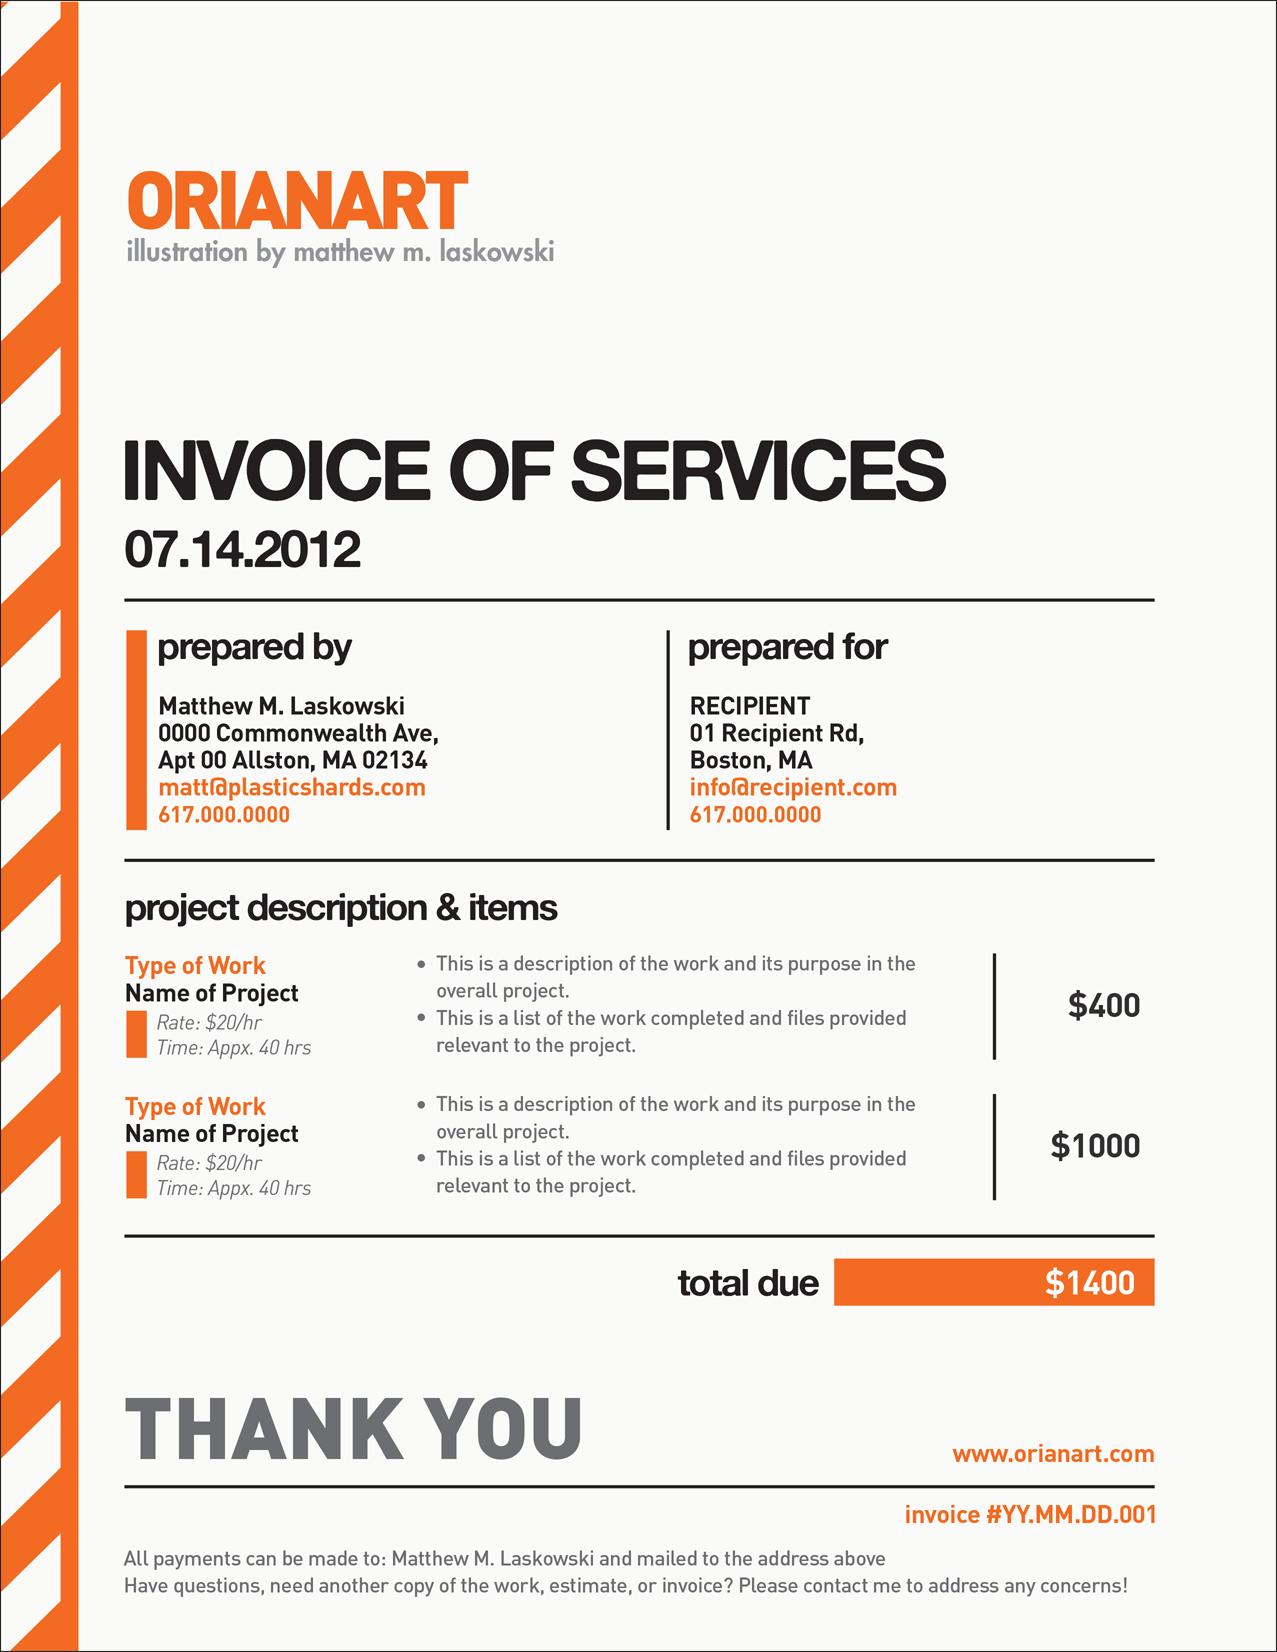 Freelance Invoice Template Free | invoice example